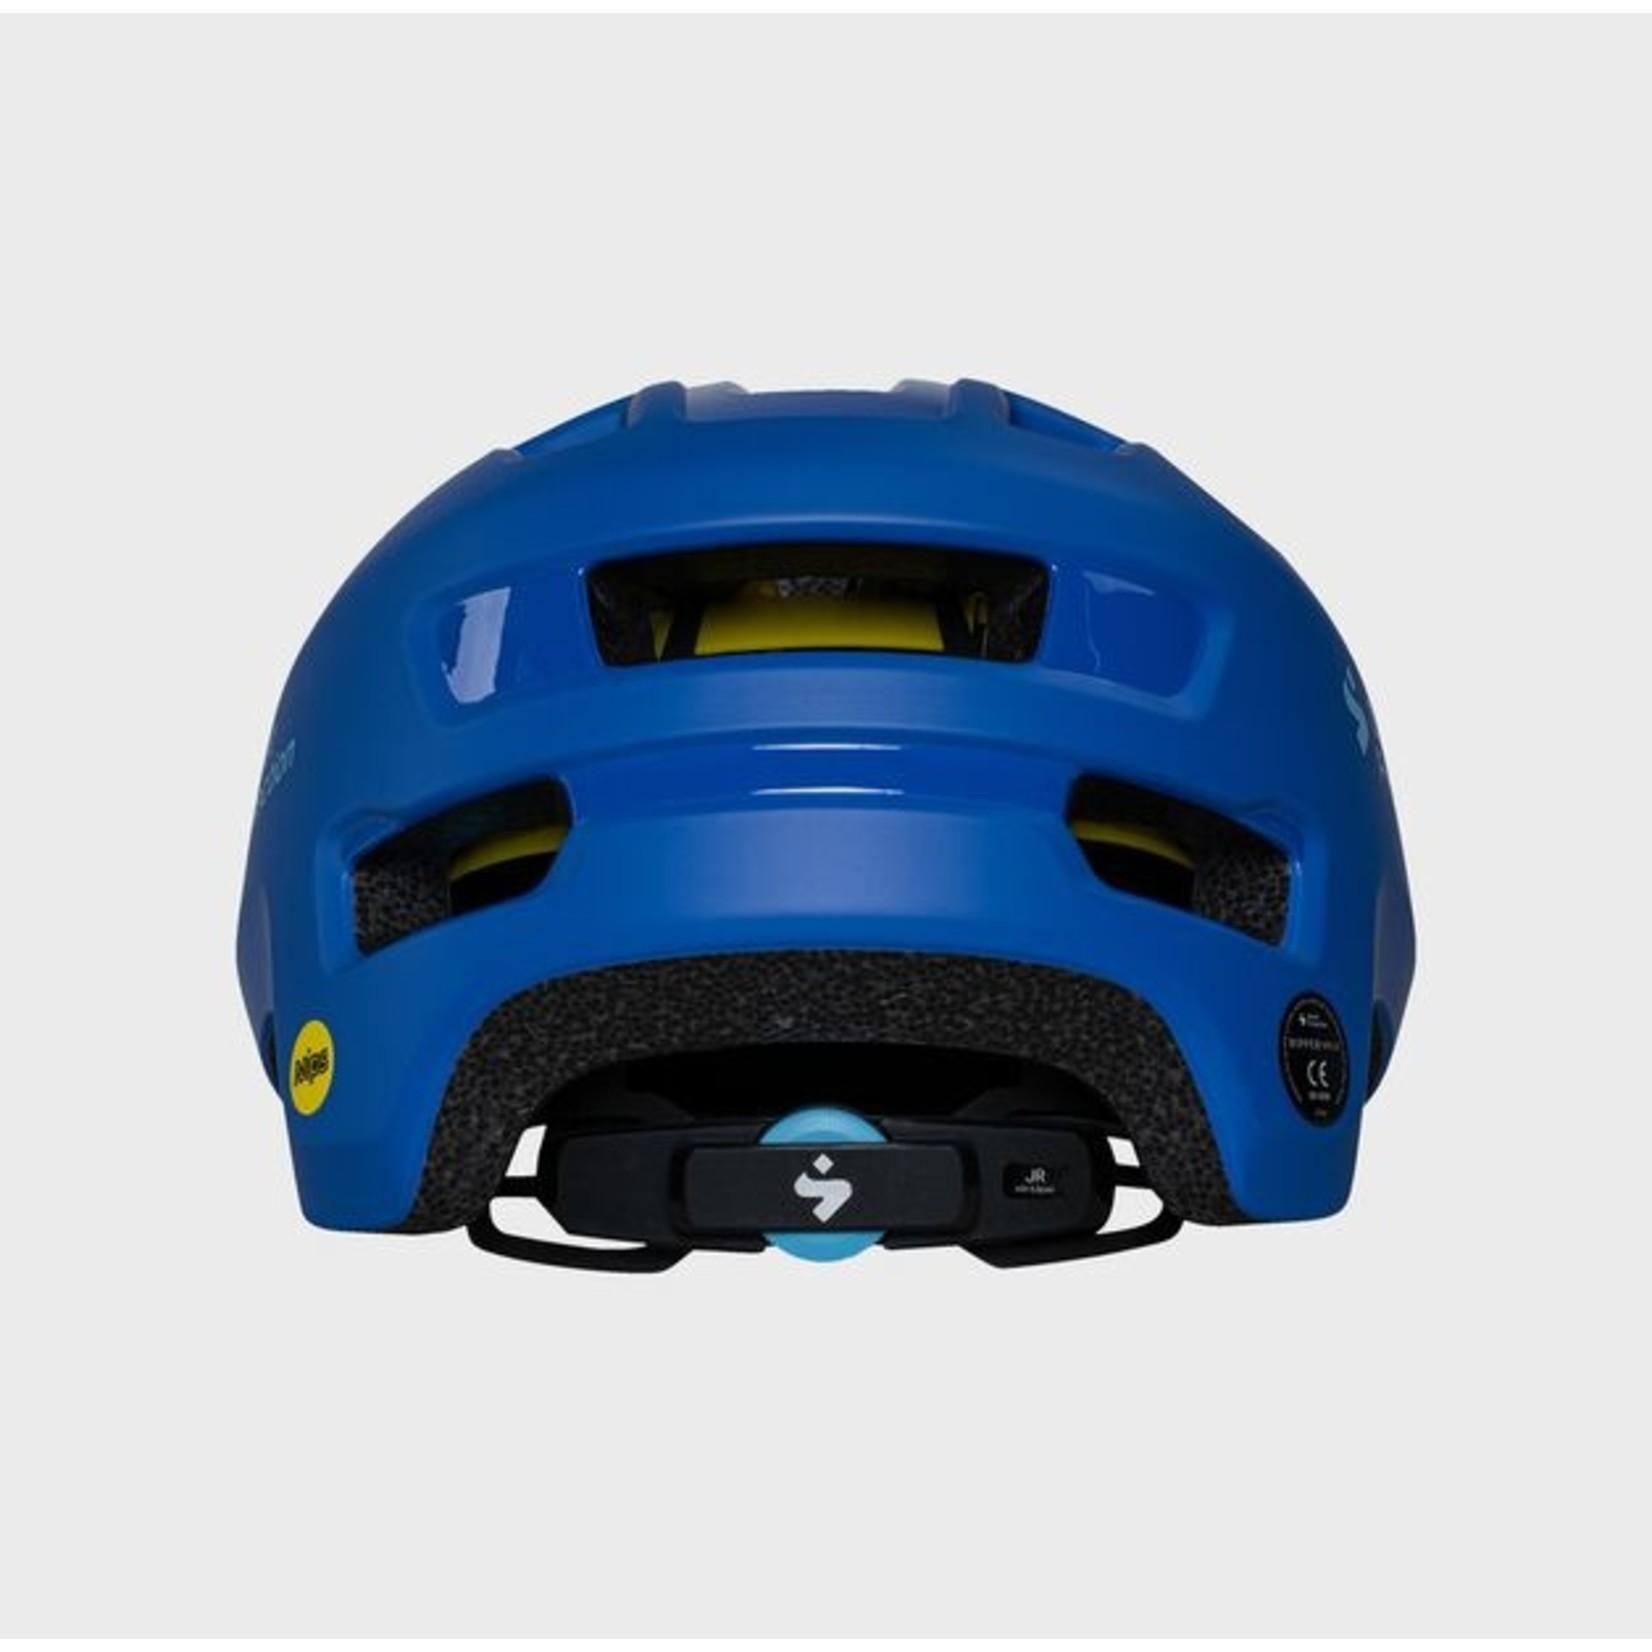 Sweet Protection Sweet Protection Ripper MIPS JR Helmet - Matt Race Blue 48/53